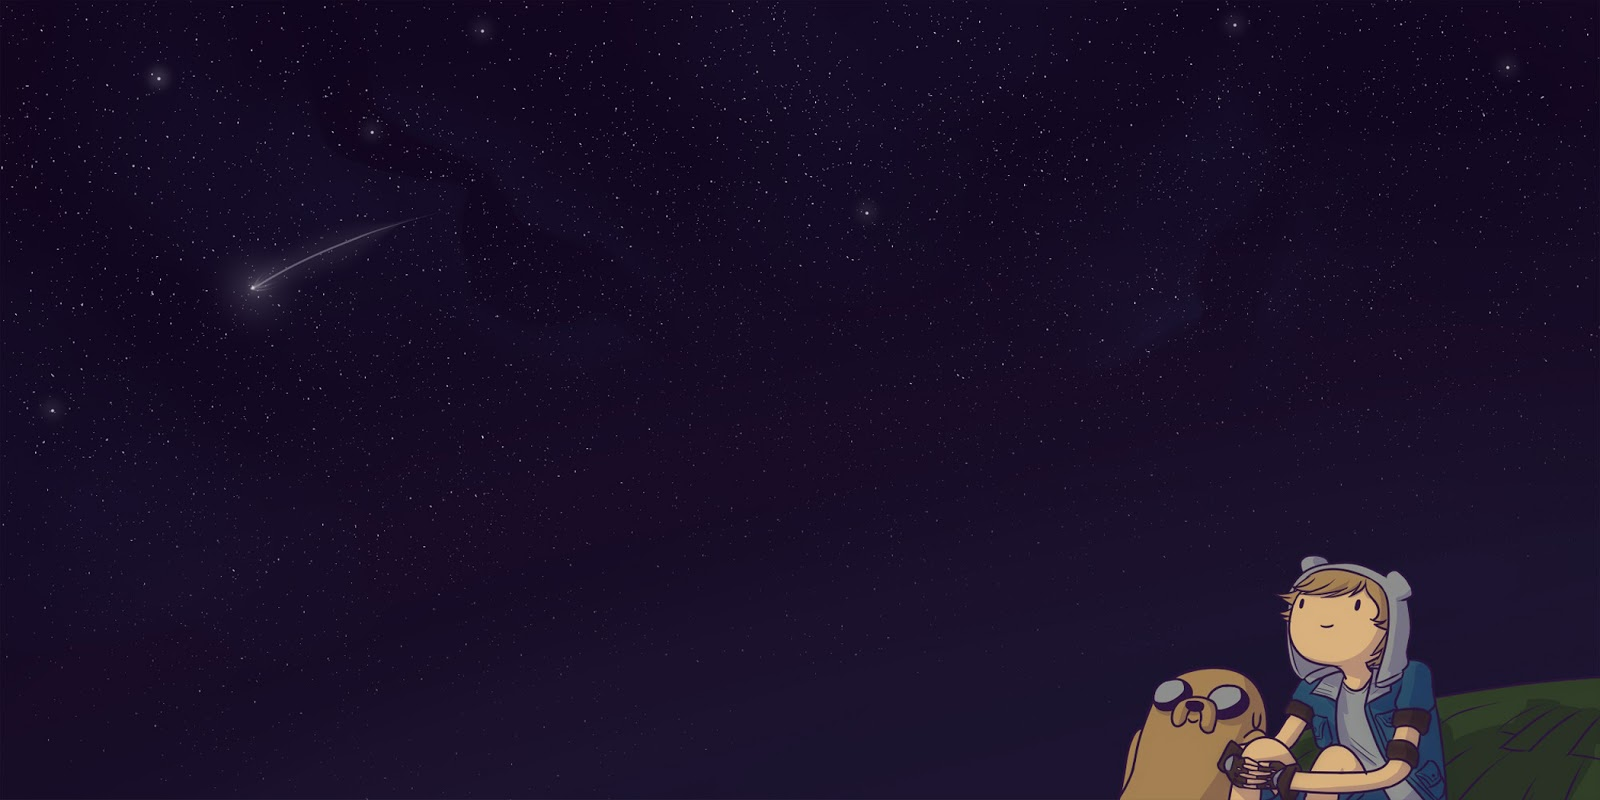 Adventure Time Cartoon Night Sky Shooting Stars Scenery HD Wallpaper 1600x800